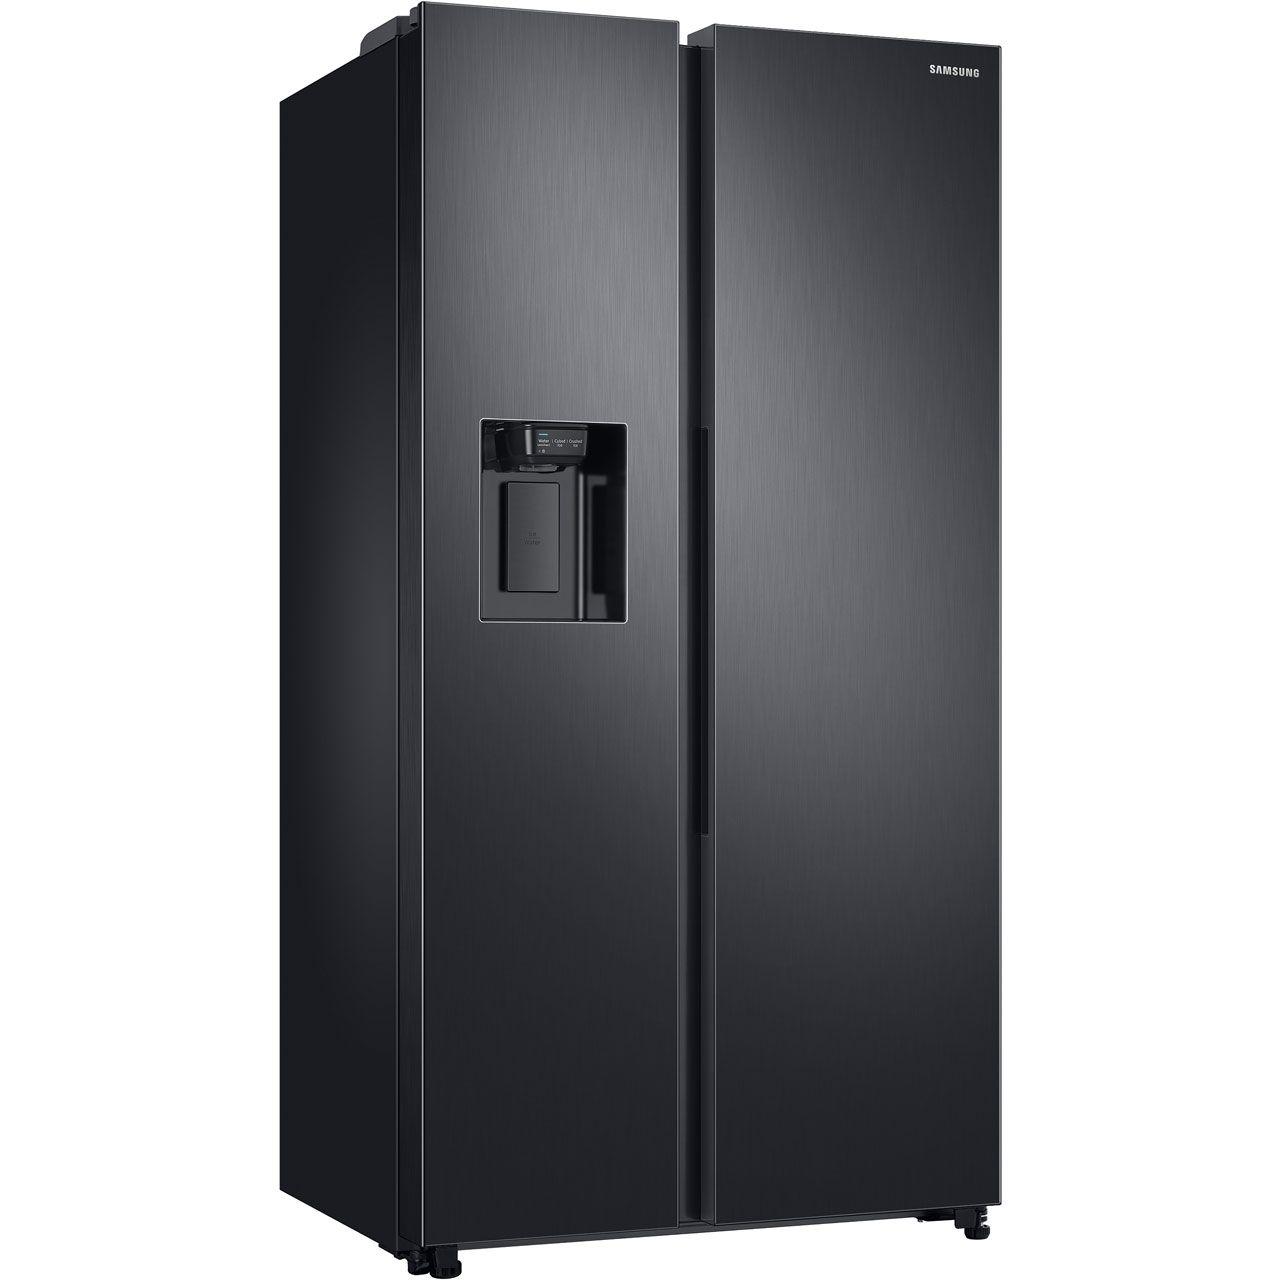 Samsung RS8000 RS68N8240B1 American Fridge Freezer